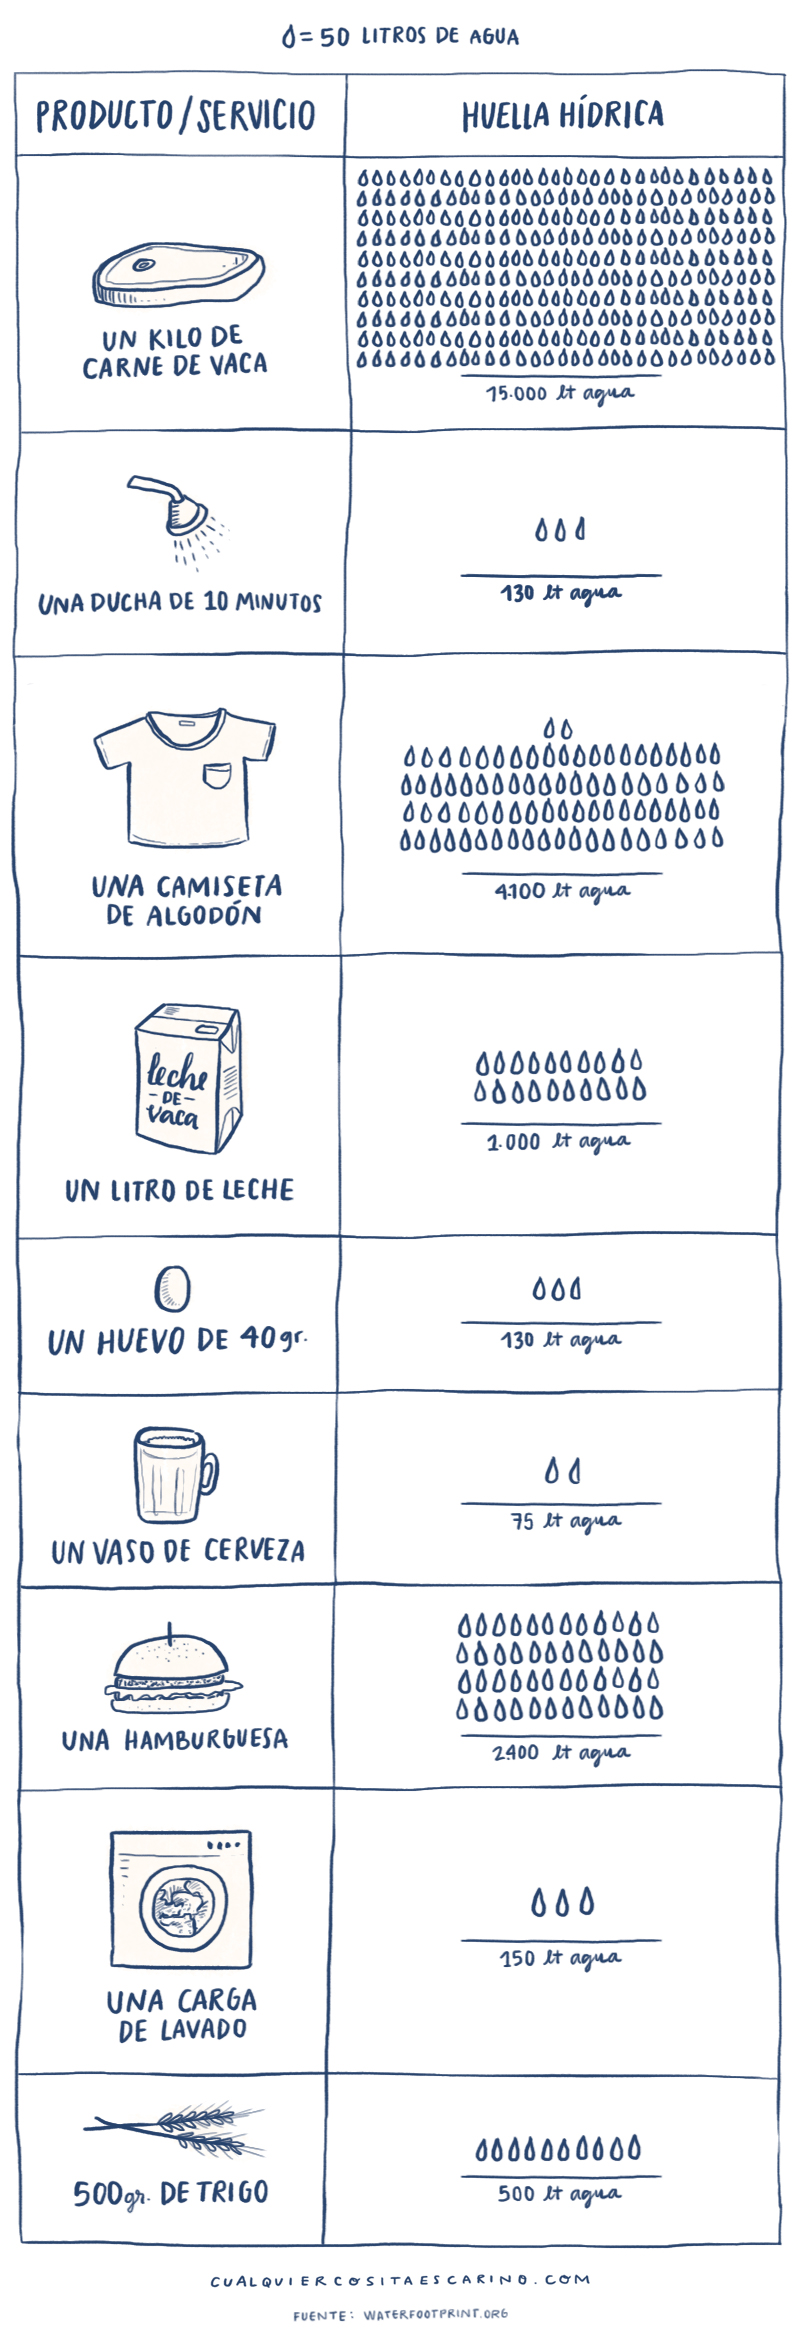 Datos huella hídrica